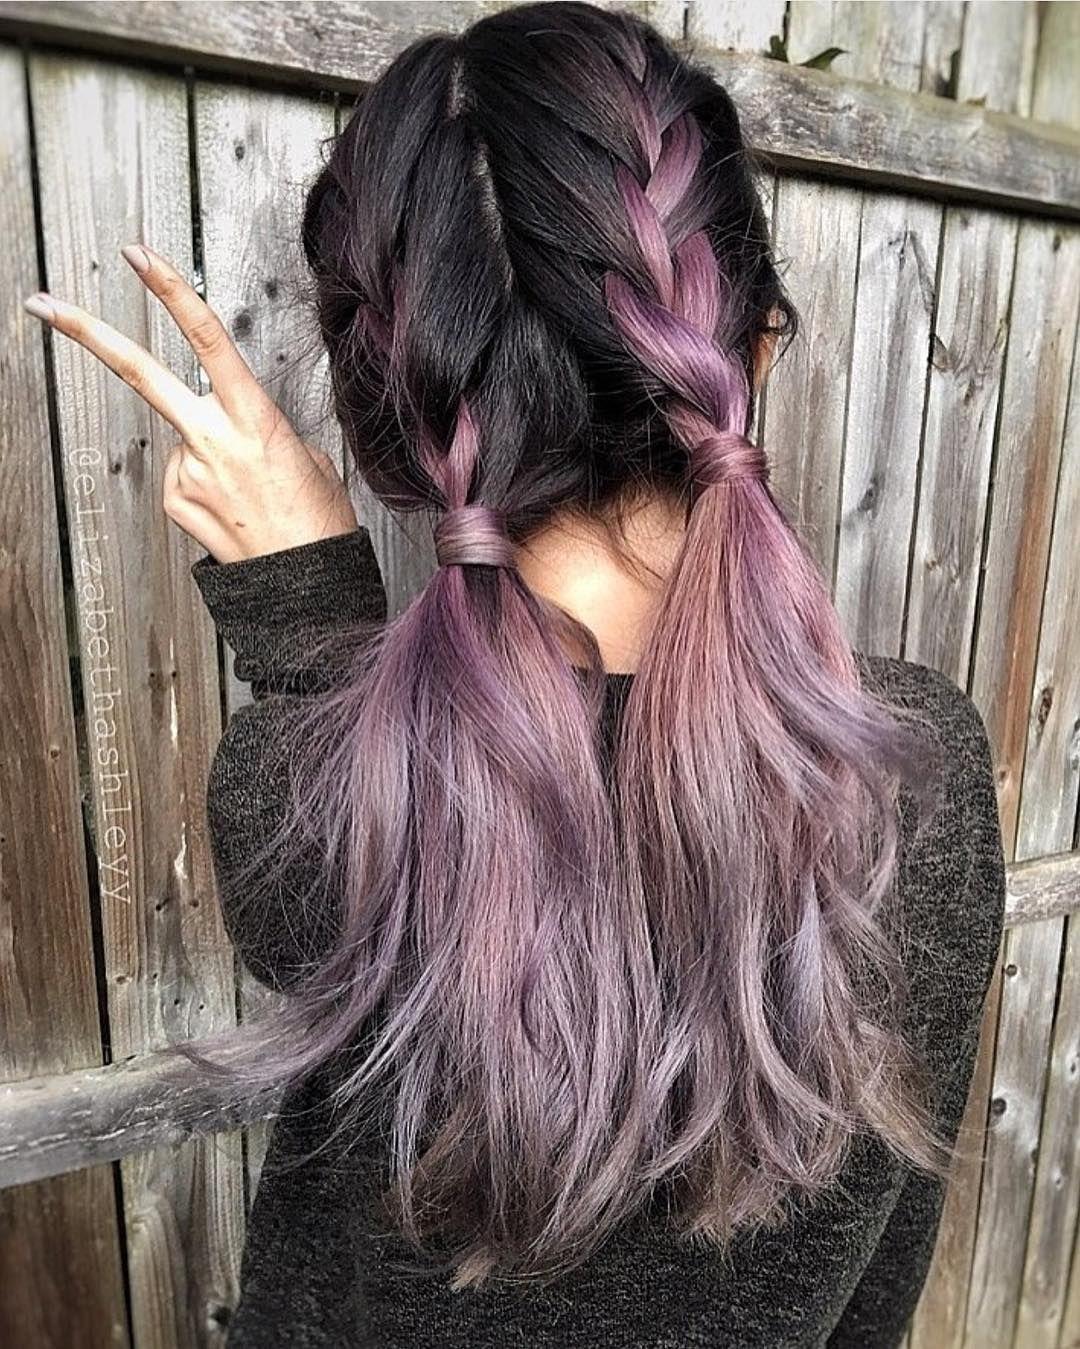 "Hot on Beauty on Instagram: ""Metallic mauve hair color by @bescene Cute country girl braids by @elizabethashleyy #hotonbeauty #hothairvids"""